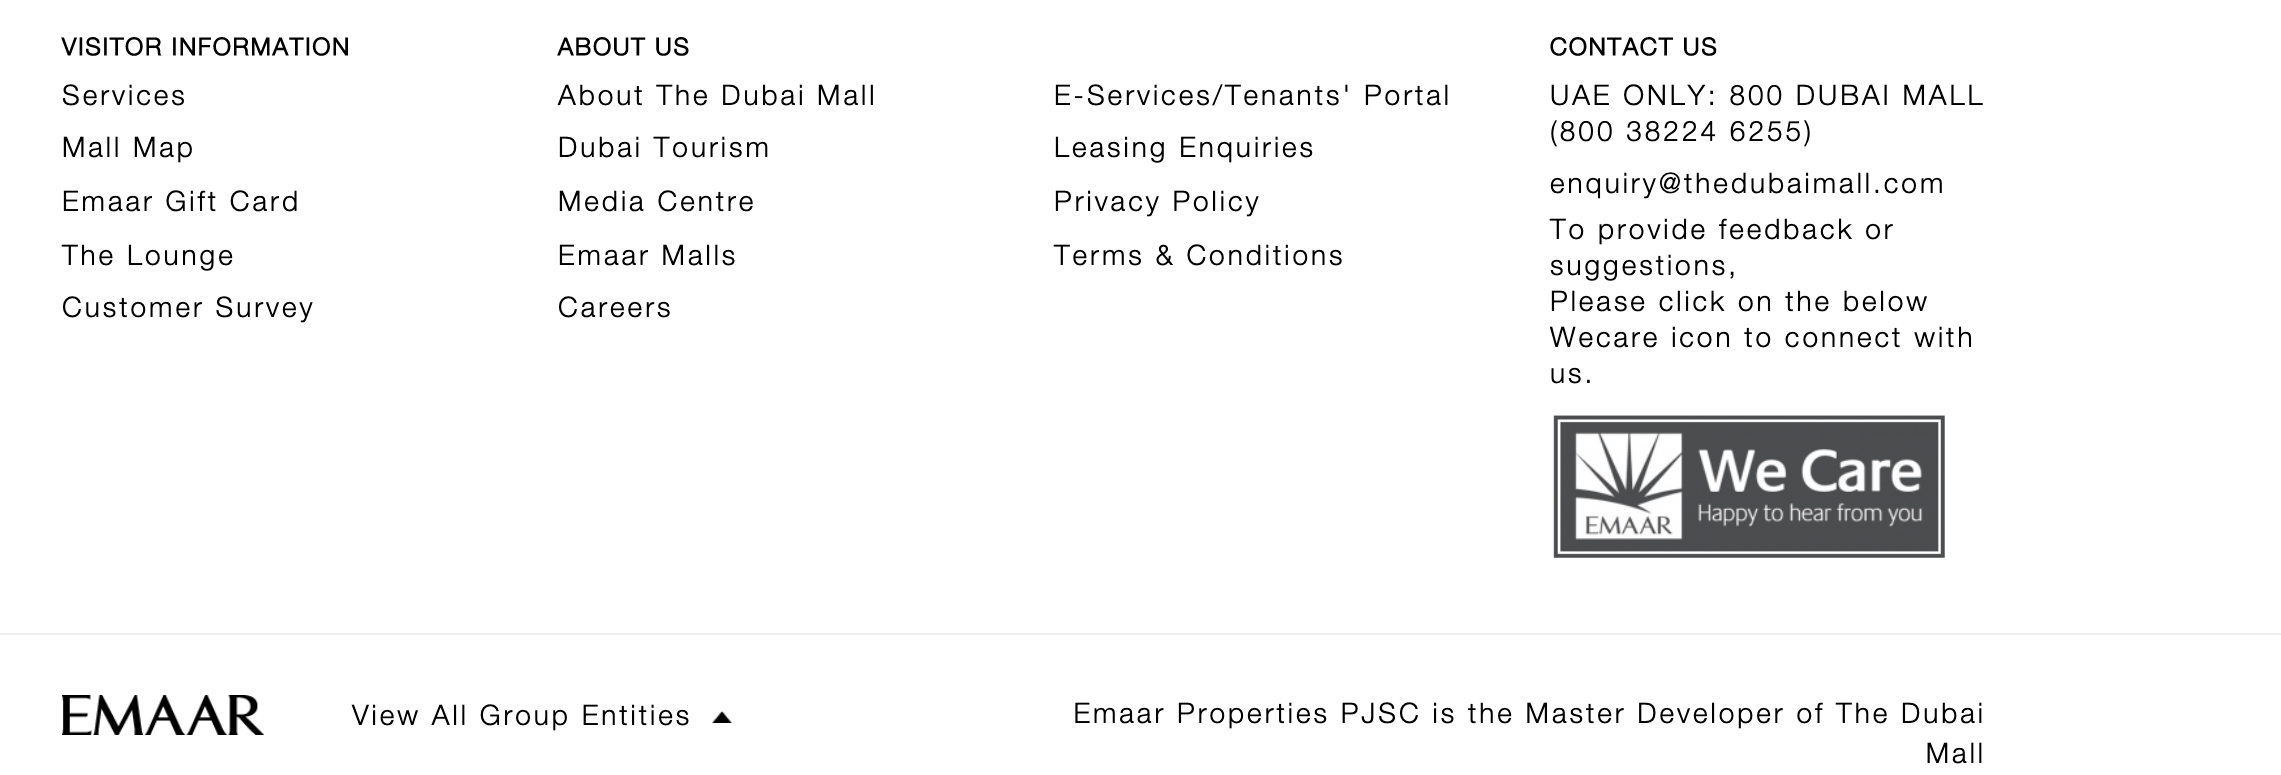 Dubai Mall contact details on website